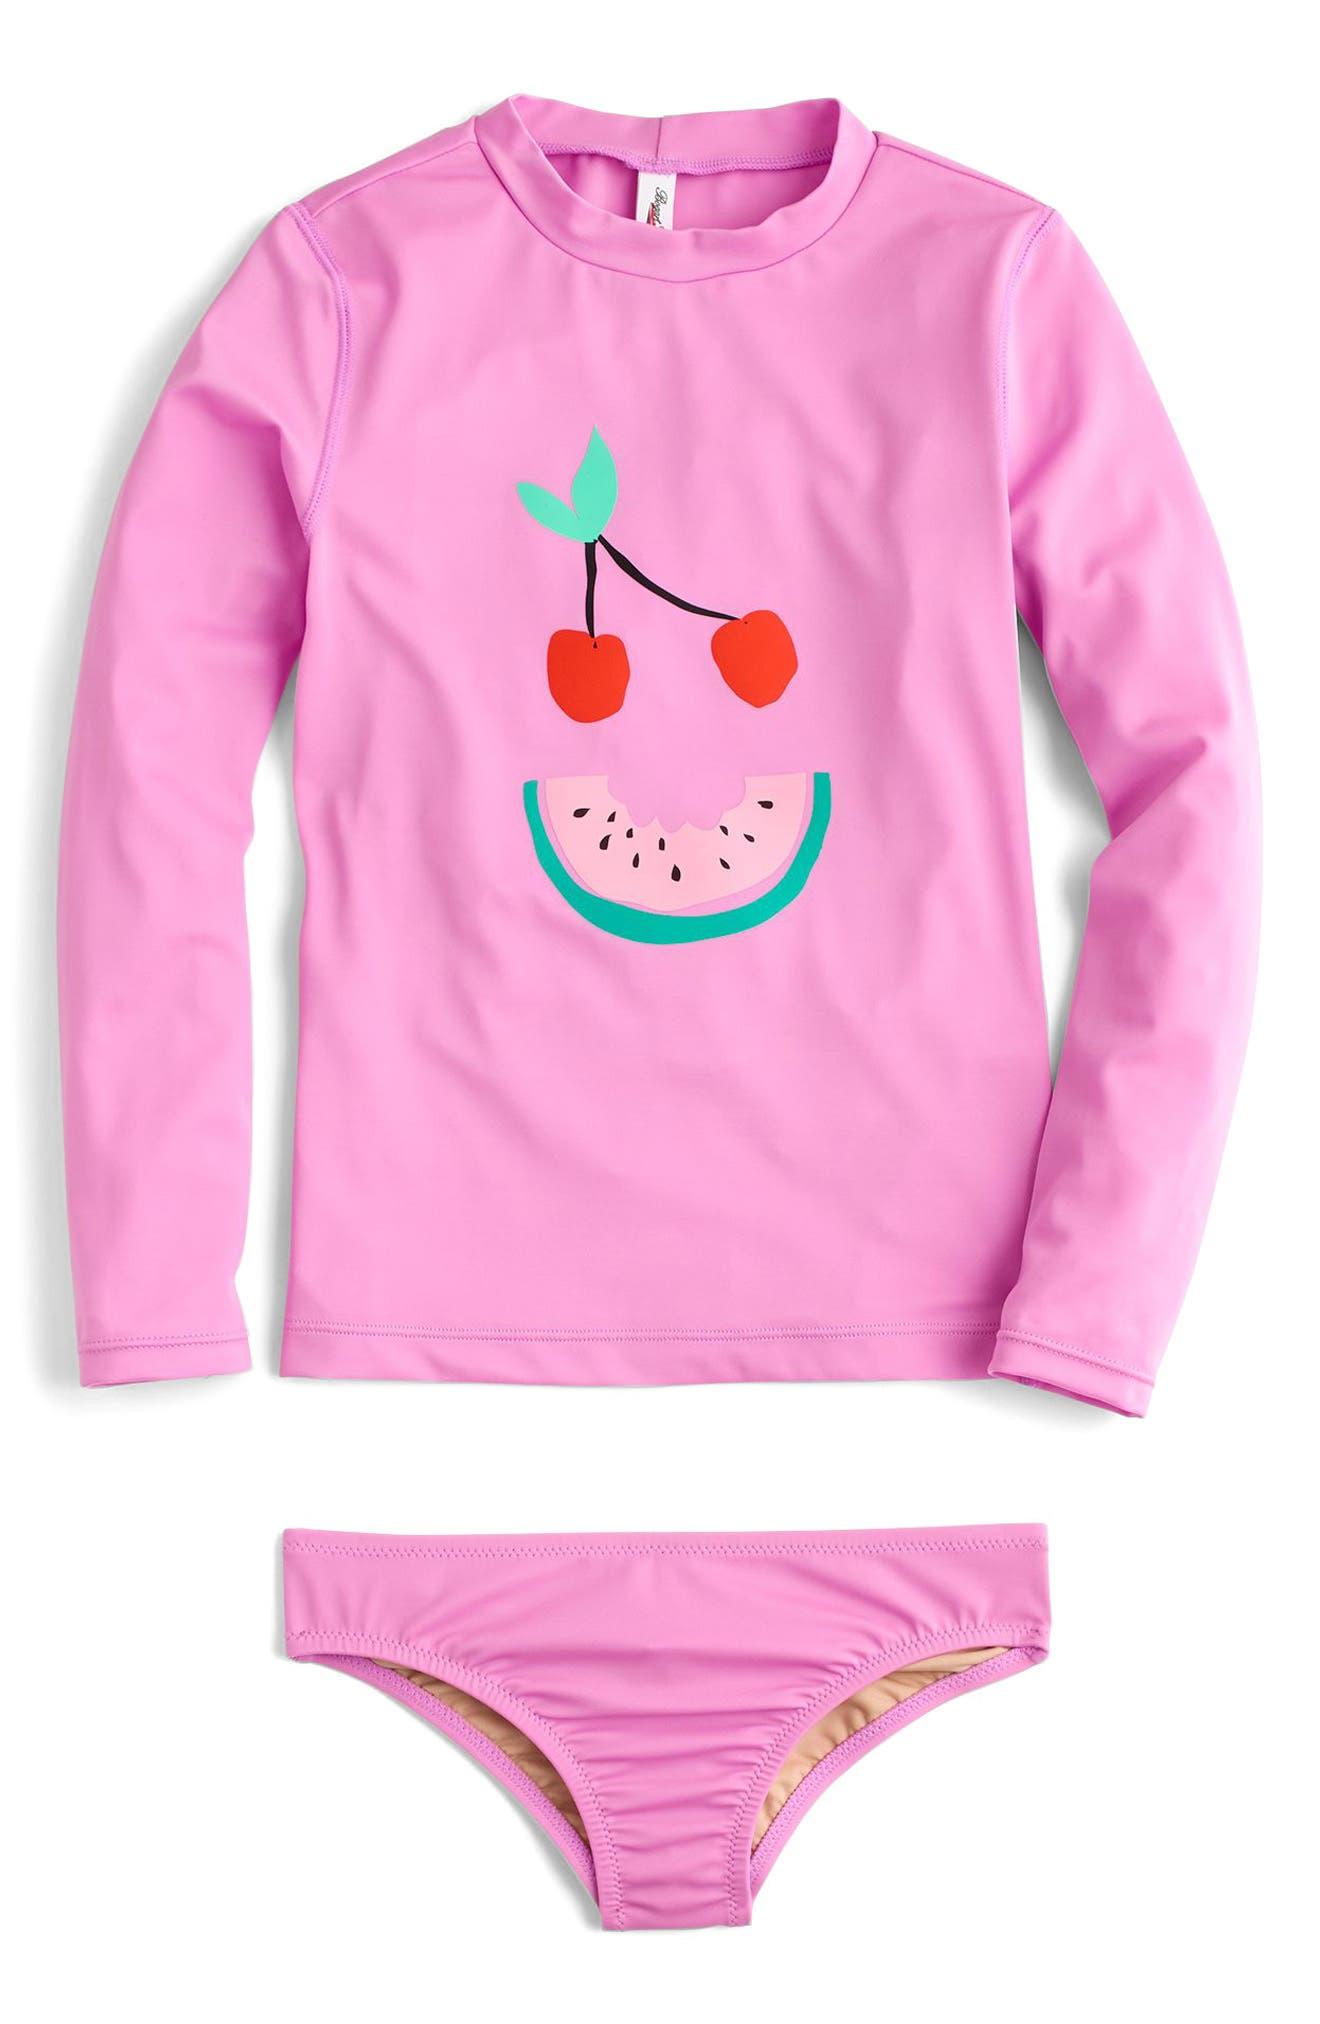 Fruit Face Two-Piece Rashguard Swimsuit,                             Main thumbnail 1, color,                             Neon Peony